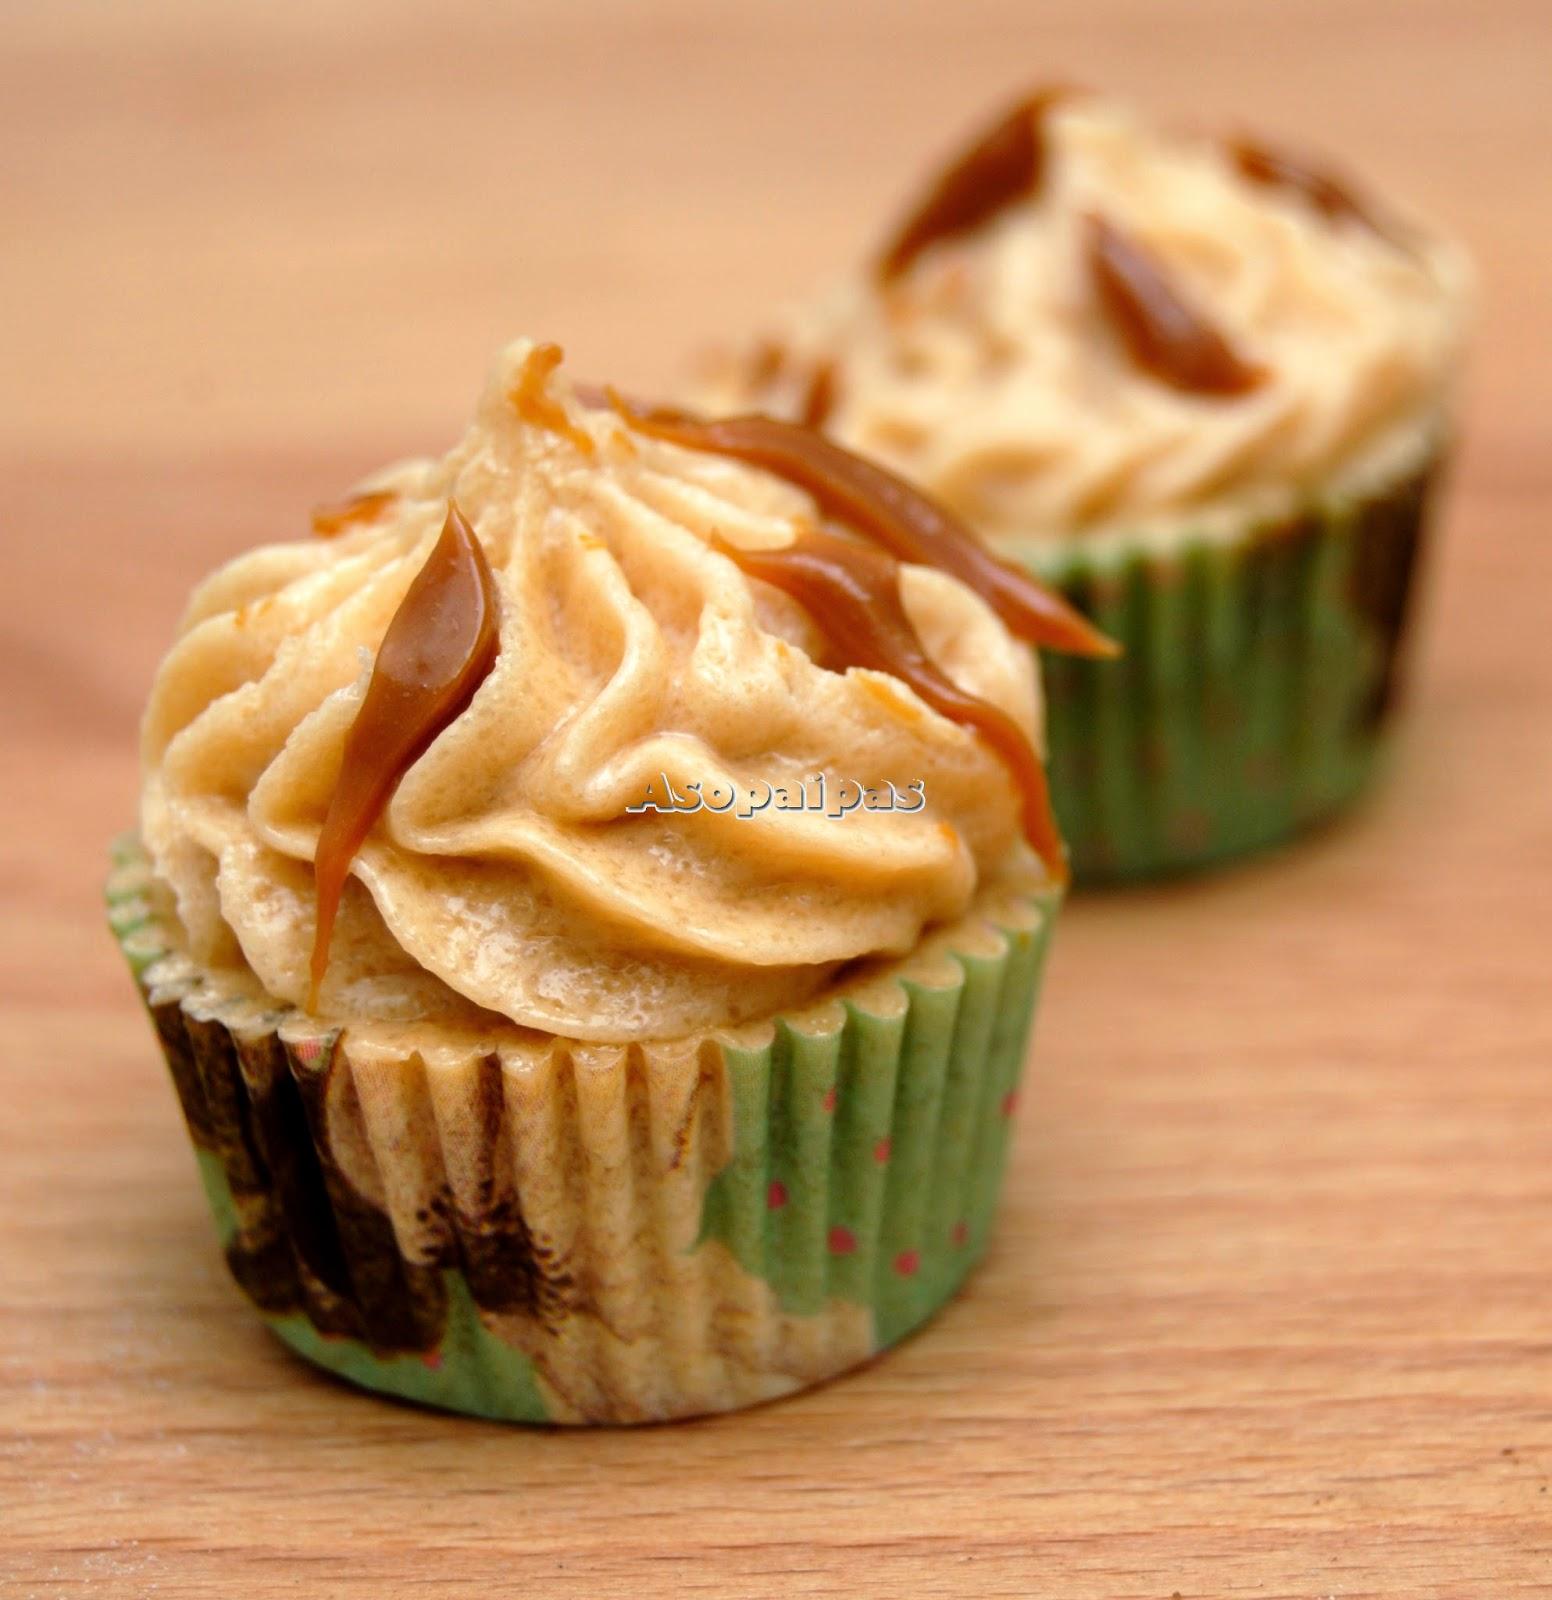 Mini Cupcakes de Dulce de Leche